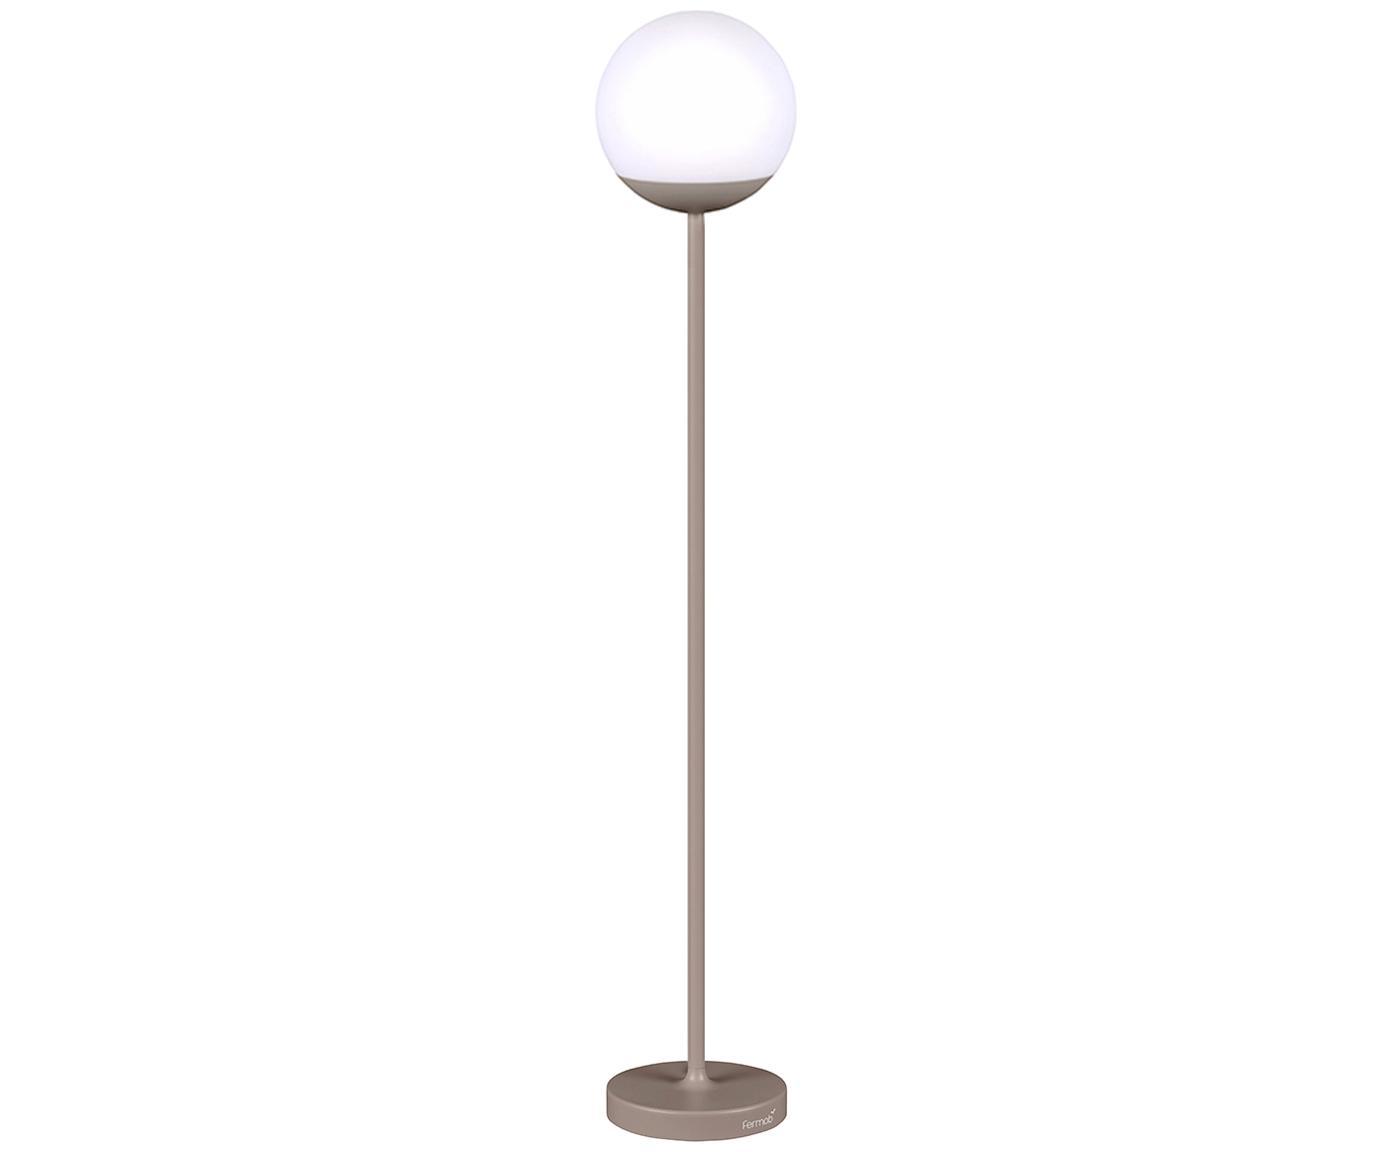 Mobile LED Aussenleuchte Mooon, Lampenschirm: Kunststoff, Muskatbraun, Ø 25 x H 134 cm